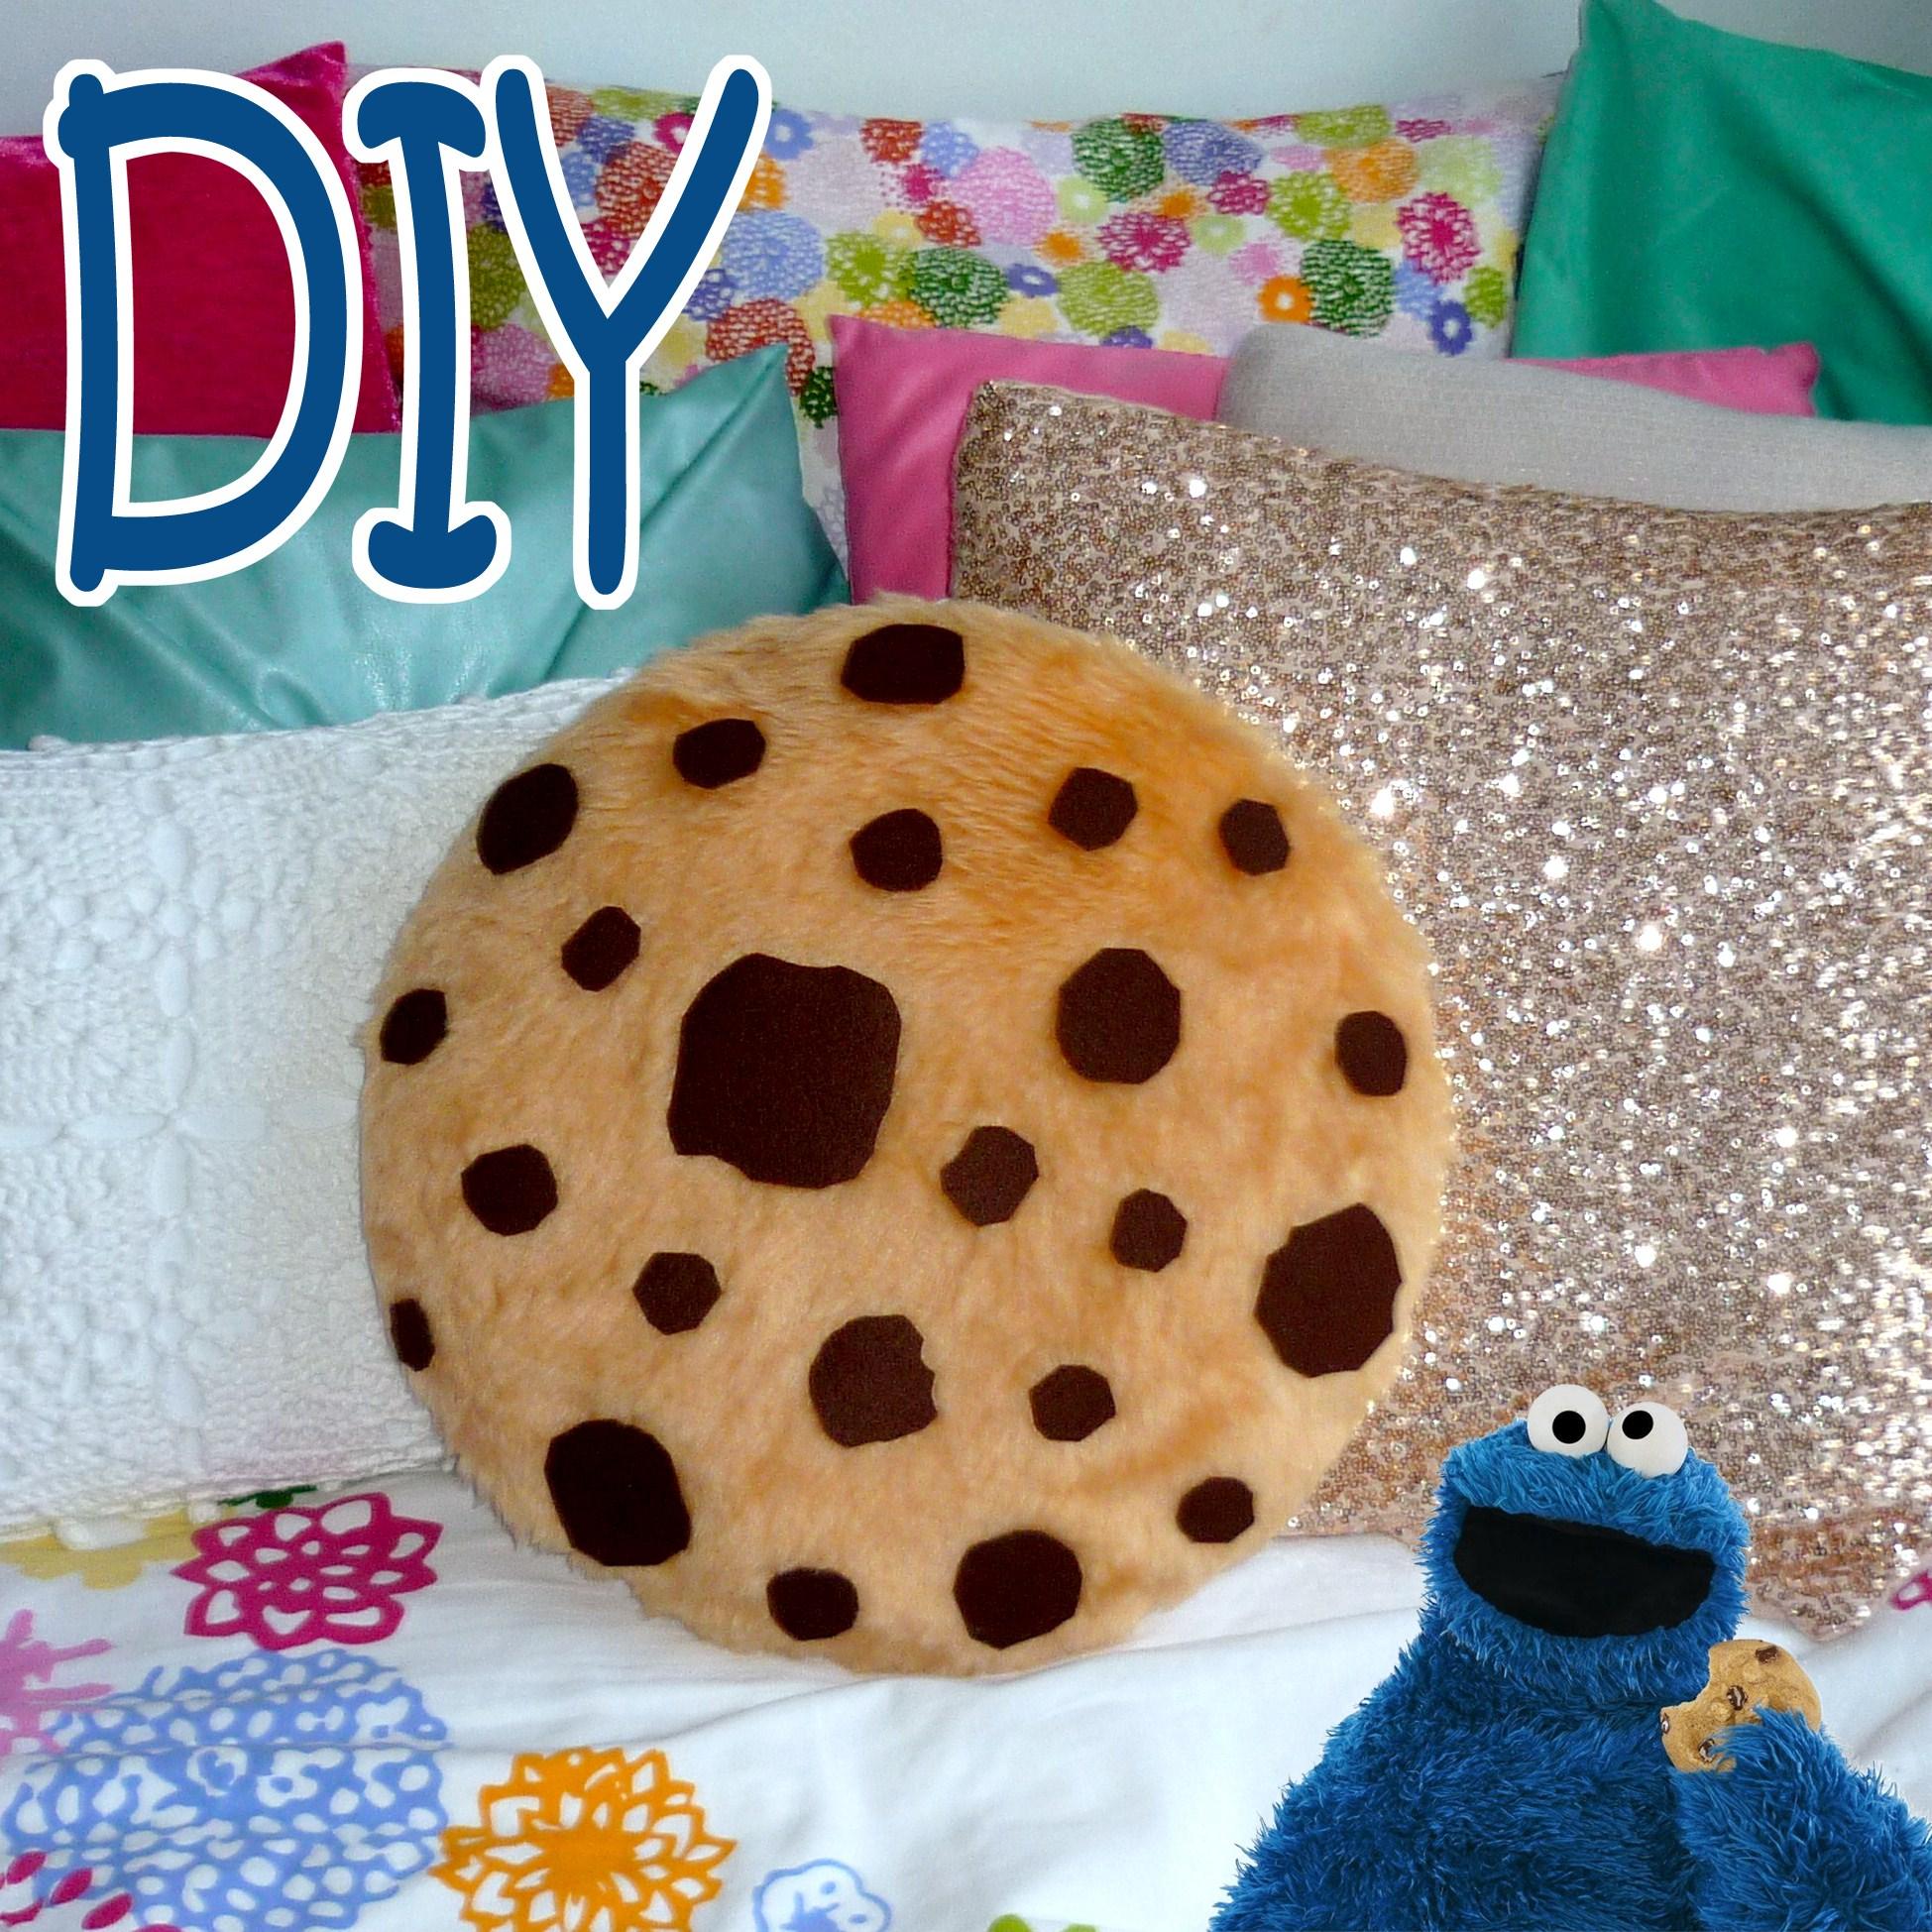 DIY ROOM DECOR ❤ Super simple COOKIE PILLOW! (Sew/No sew)